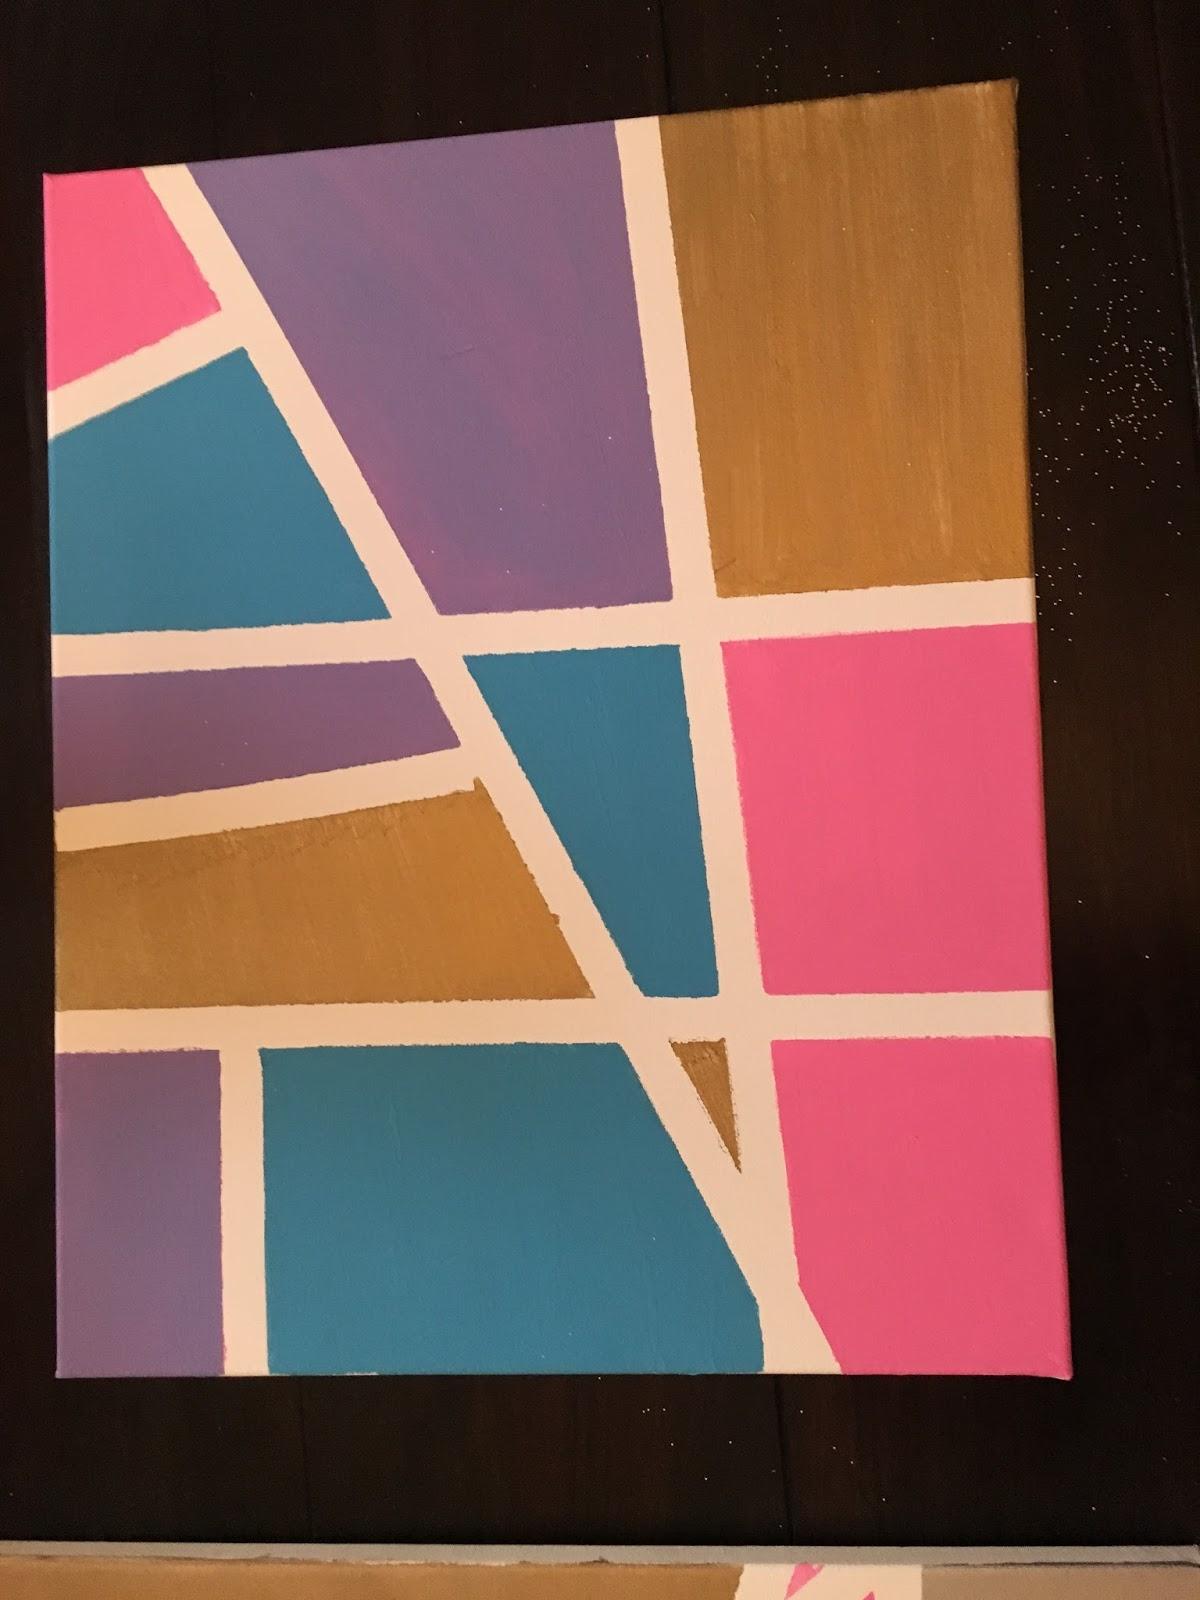 Crafty Texas Girls Diy Abstract Art Using Tape Paint